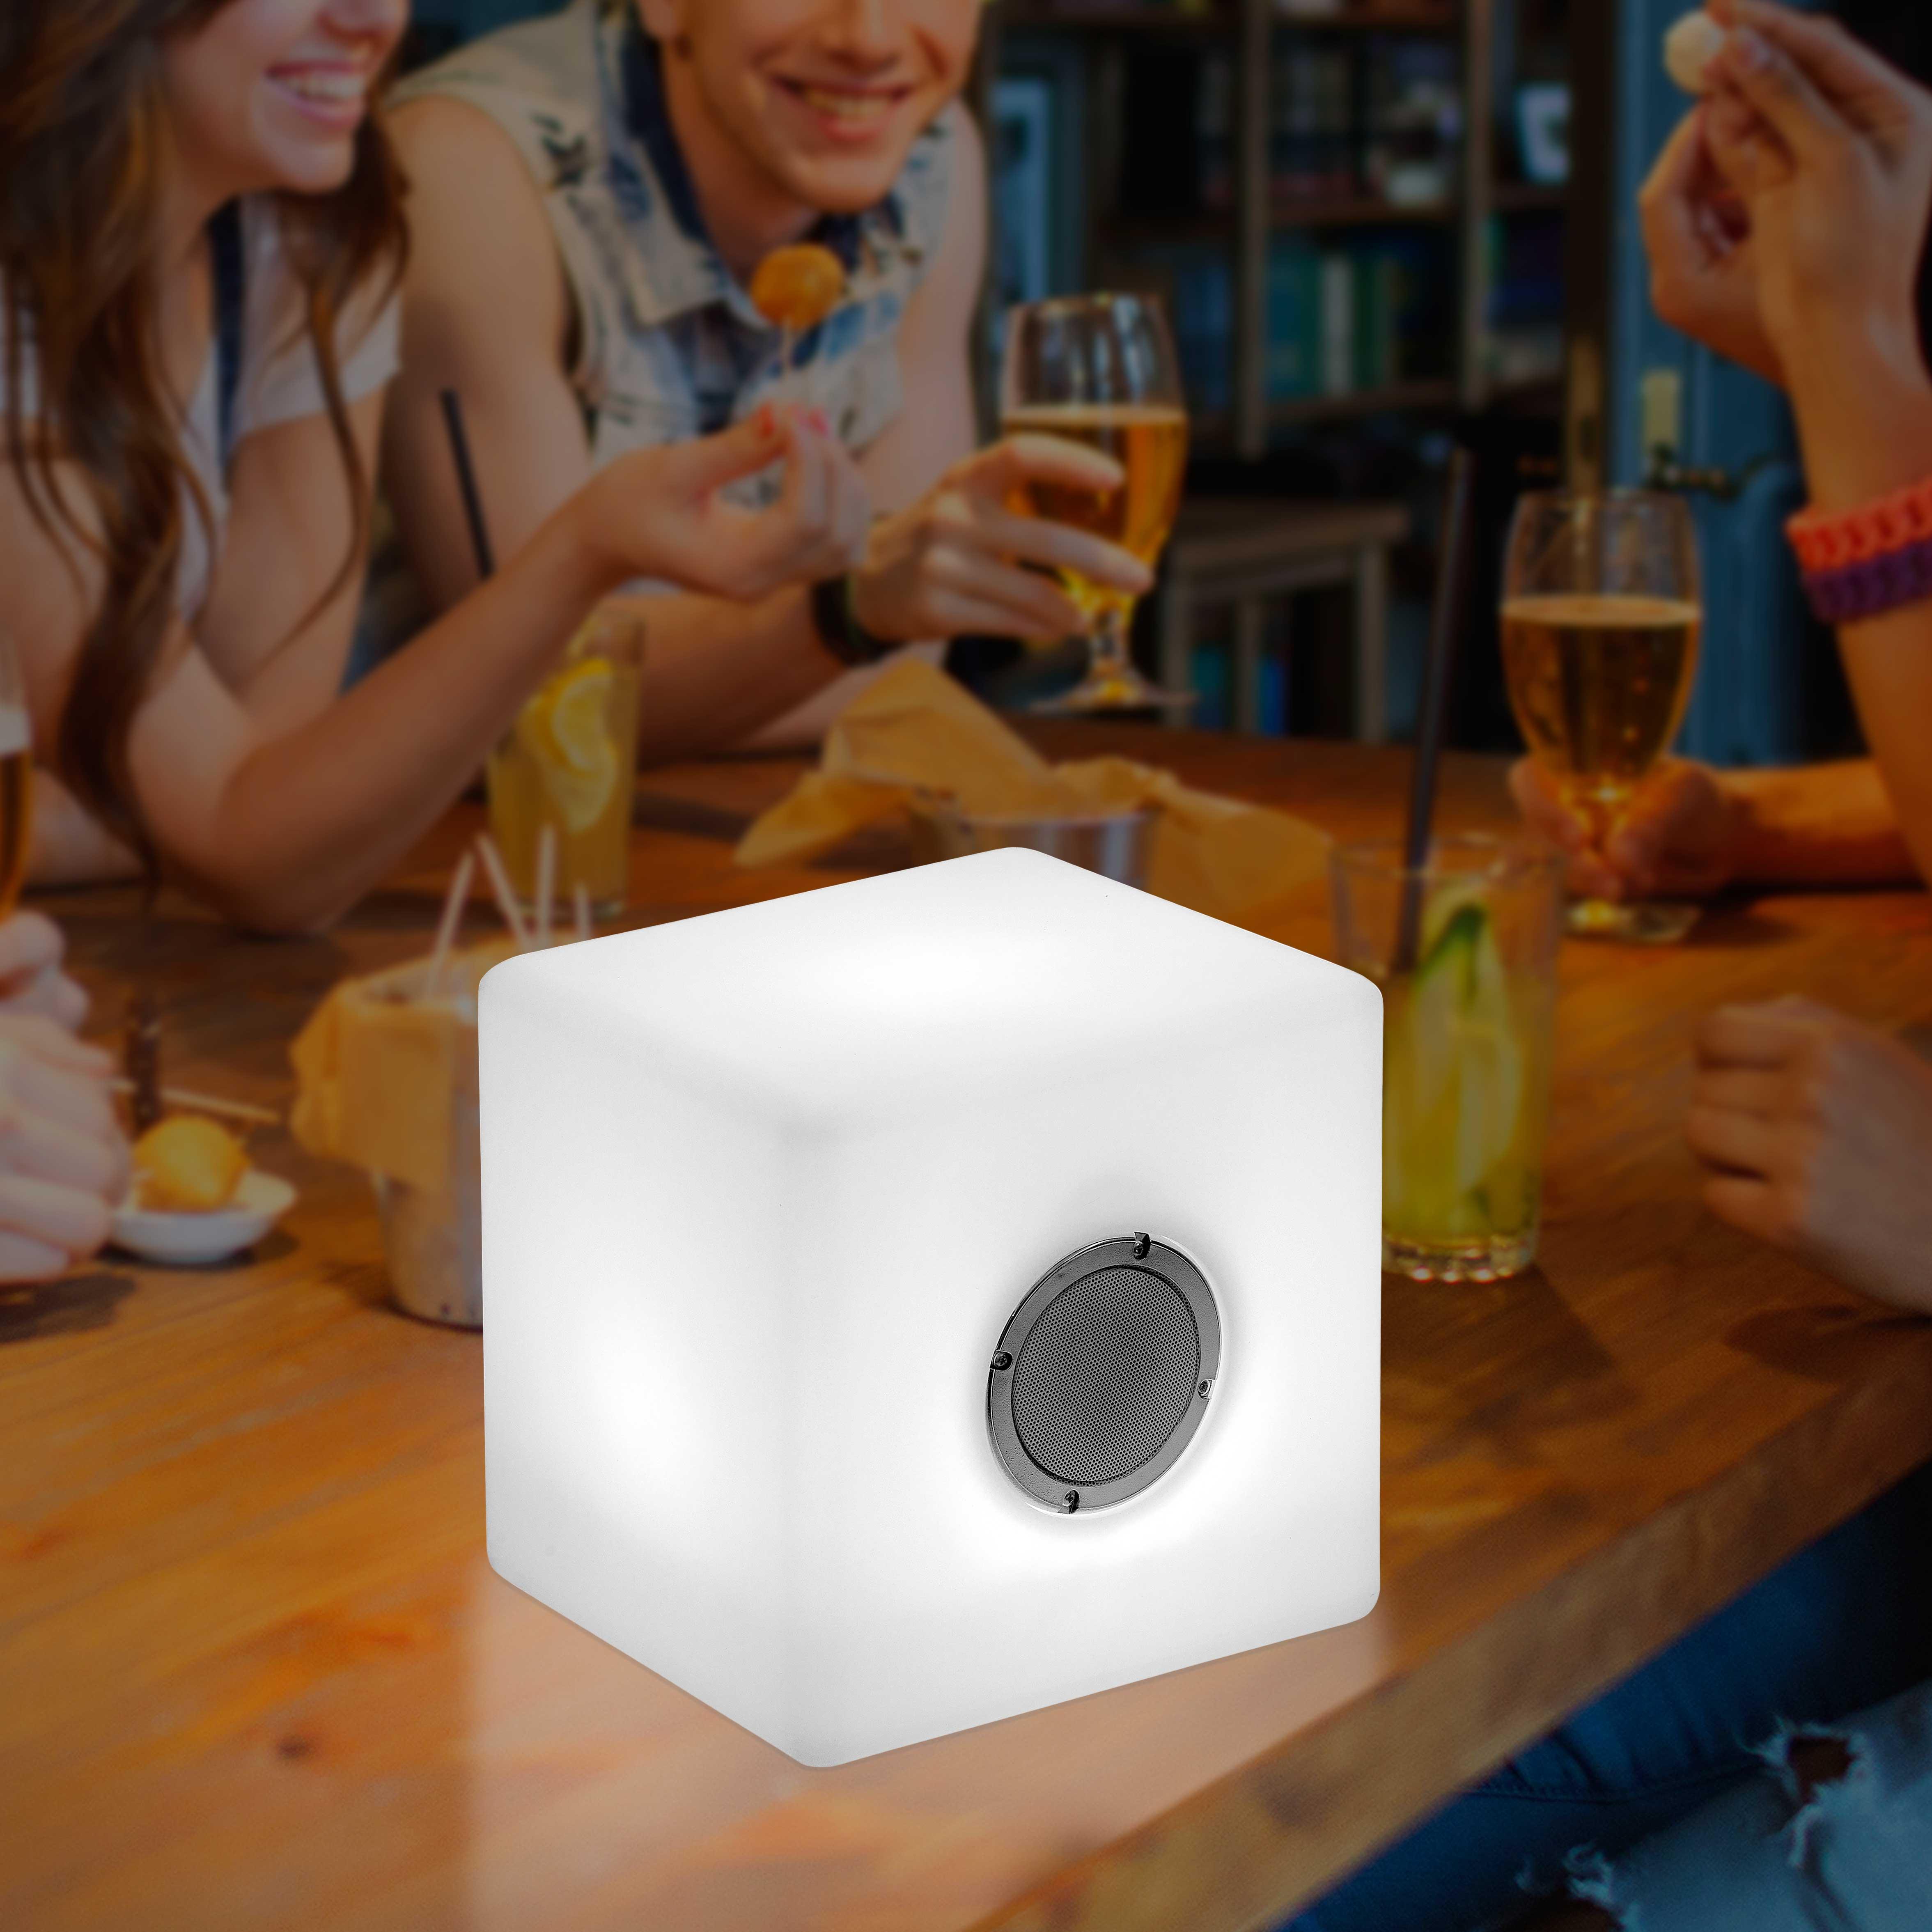 Wireless Illuminated Small Bluetooth Cube Speaker